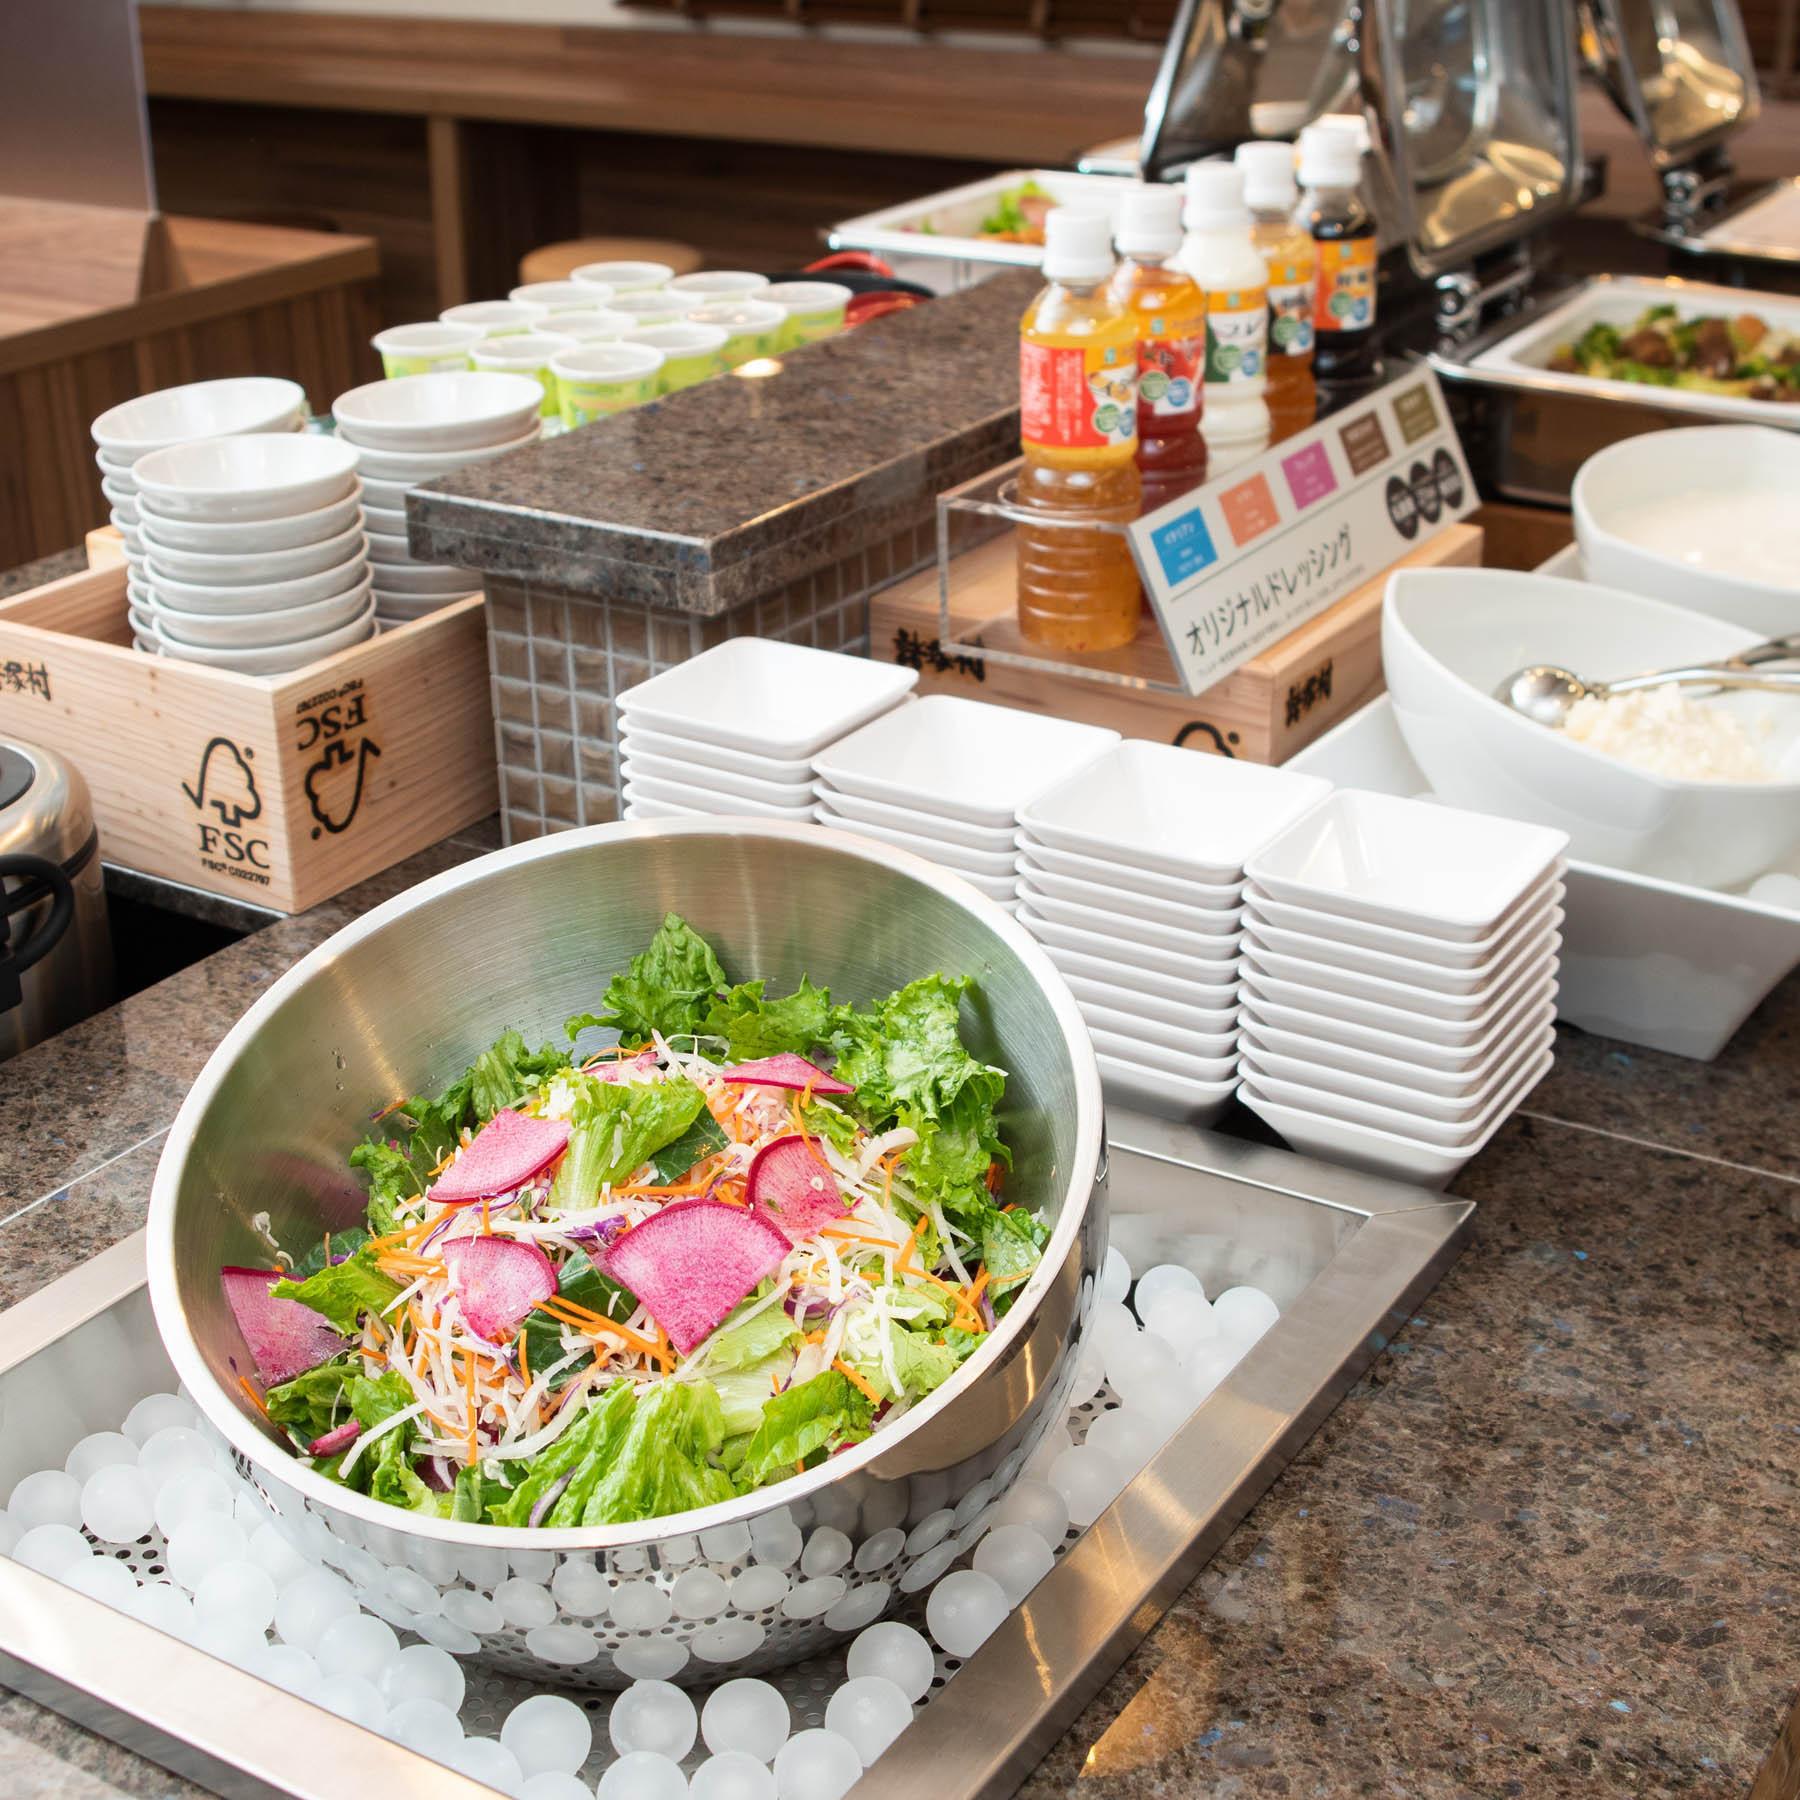 【Organic】有機JAS認定の新鮮なサラダ♪全体の1%に満たない稀少なサラダを毎朝ご提供♪